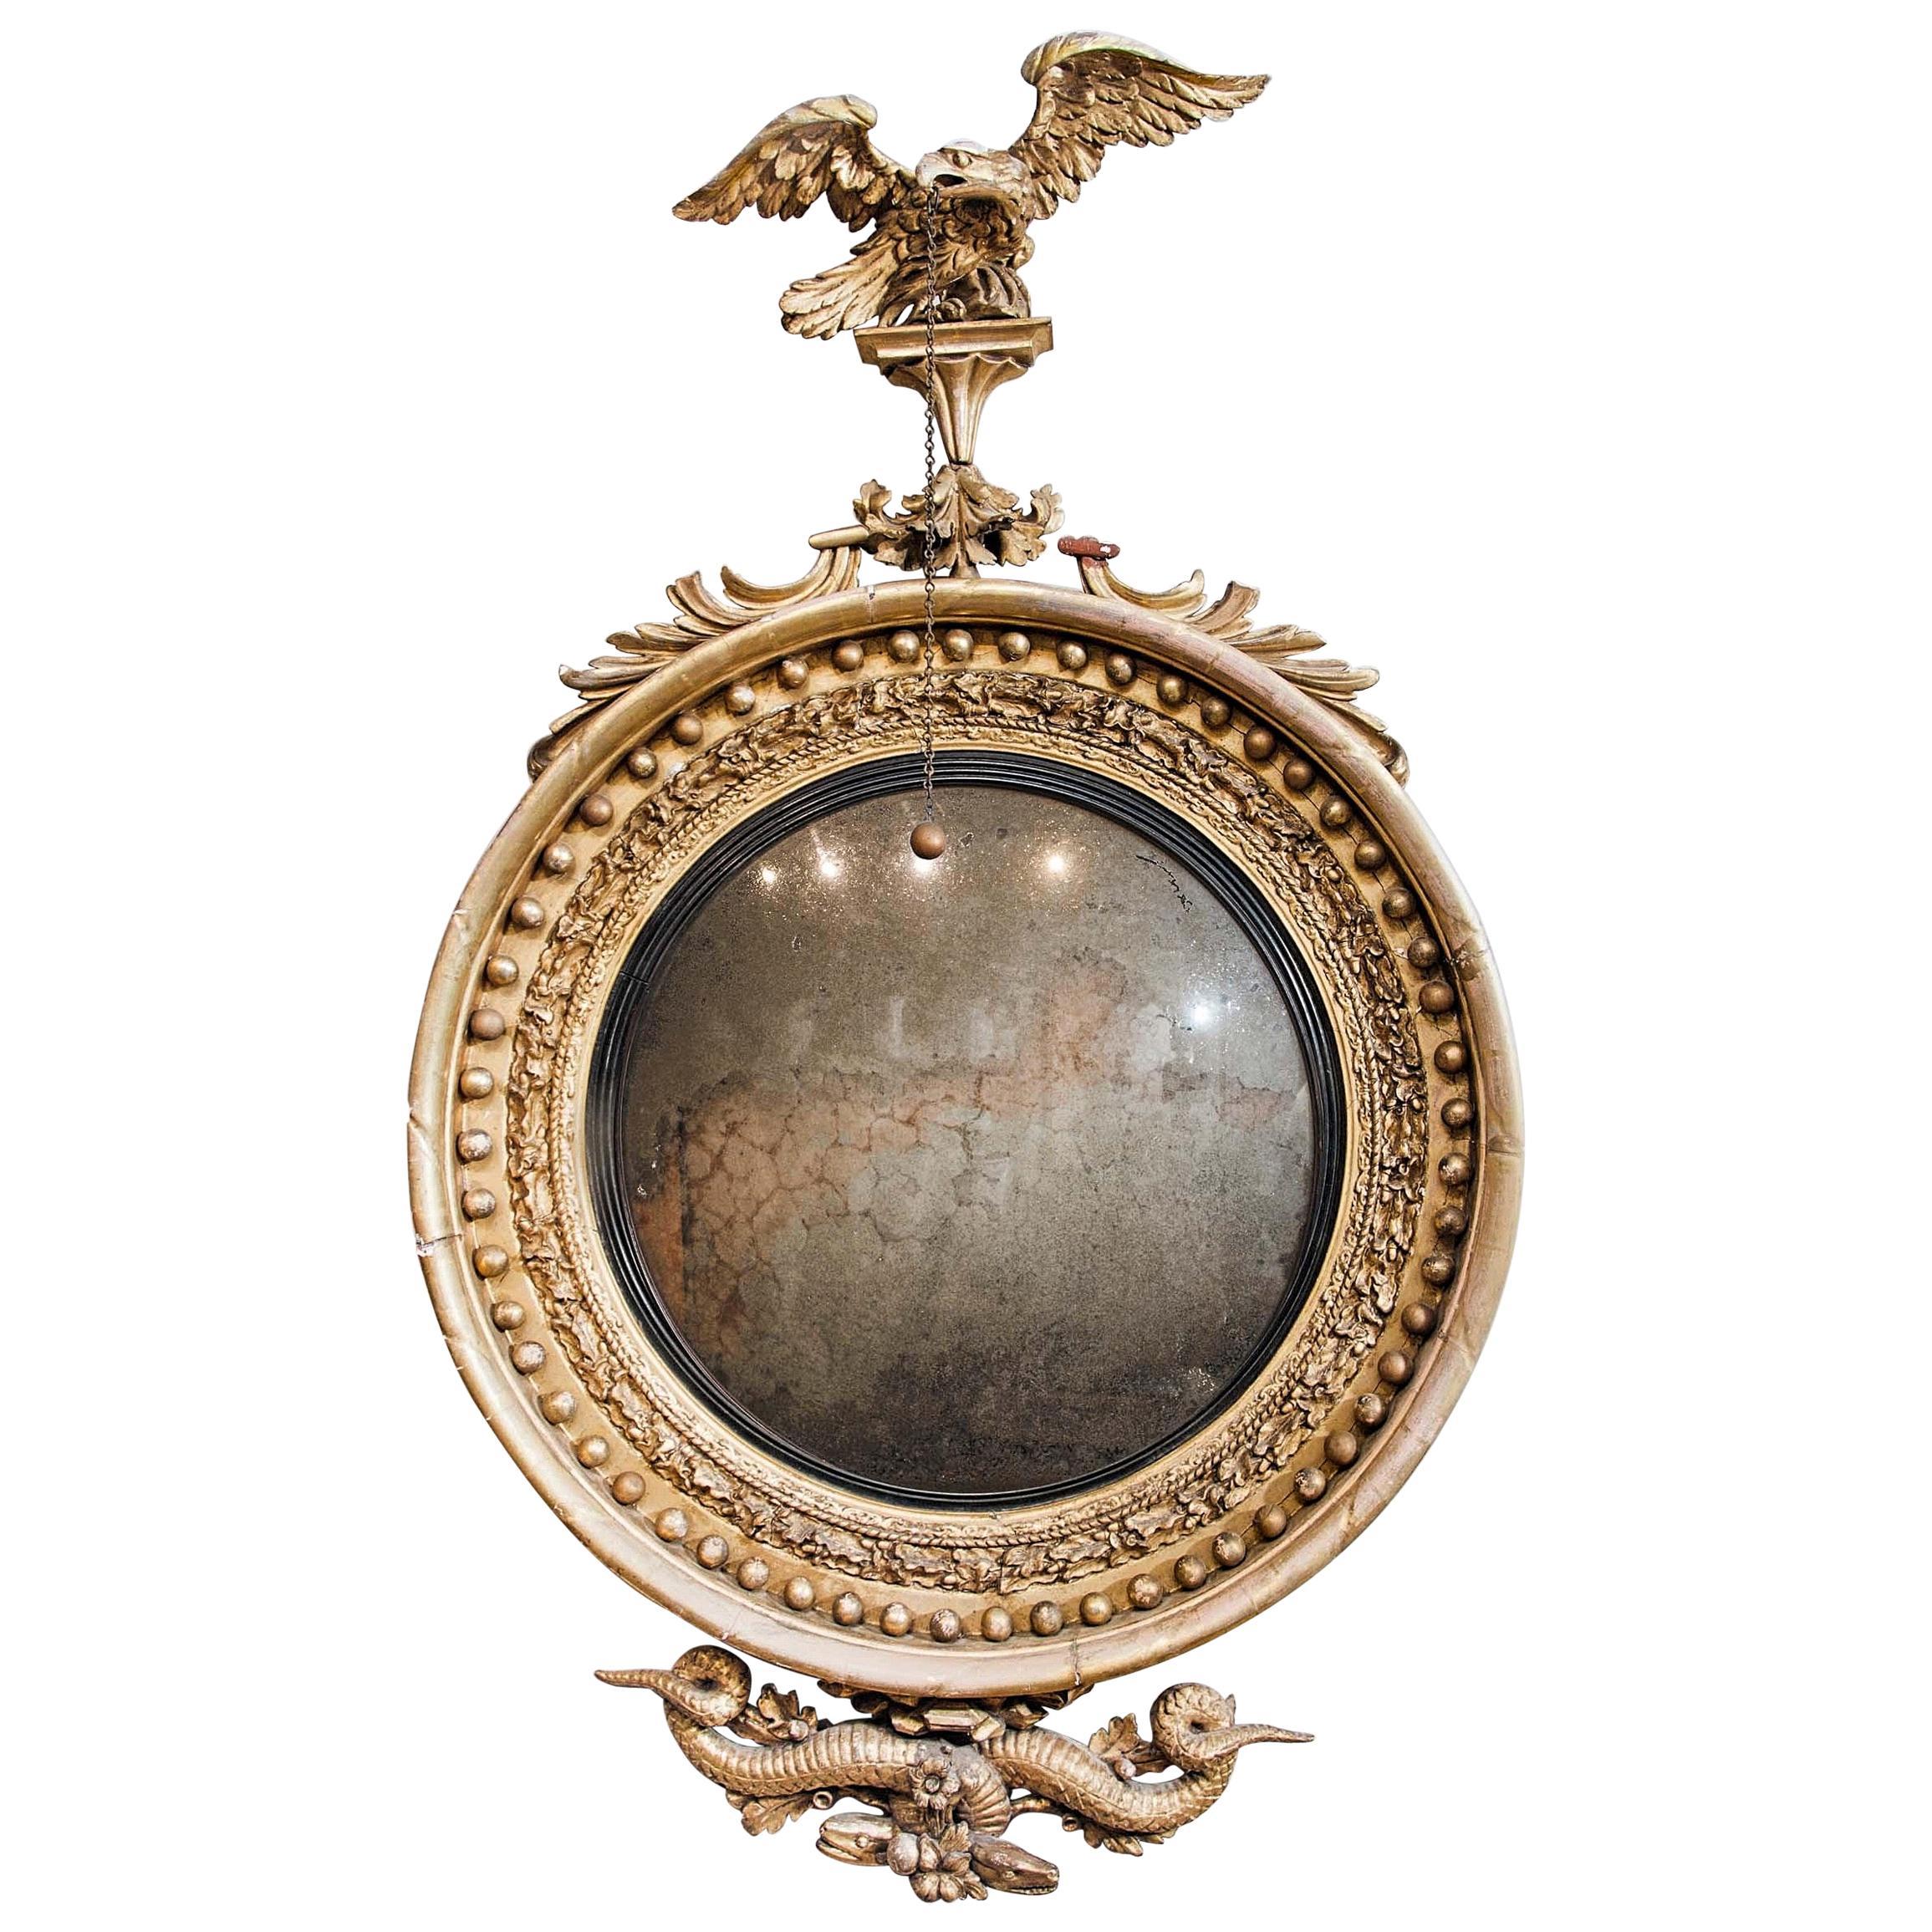 Monumental English Regency Giltwood Convex Mirror, circa 1820